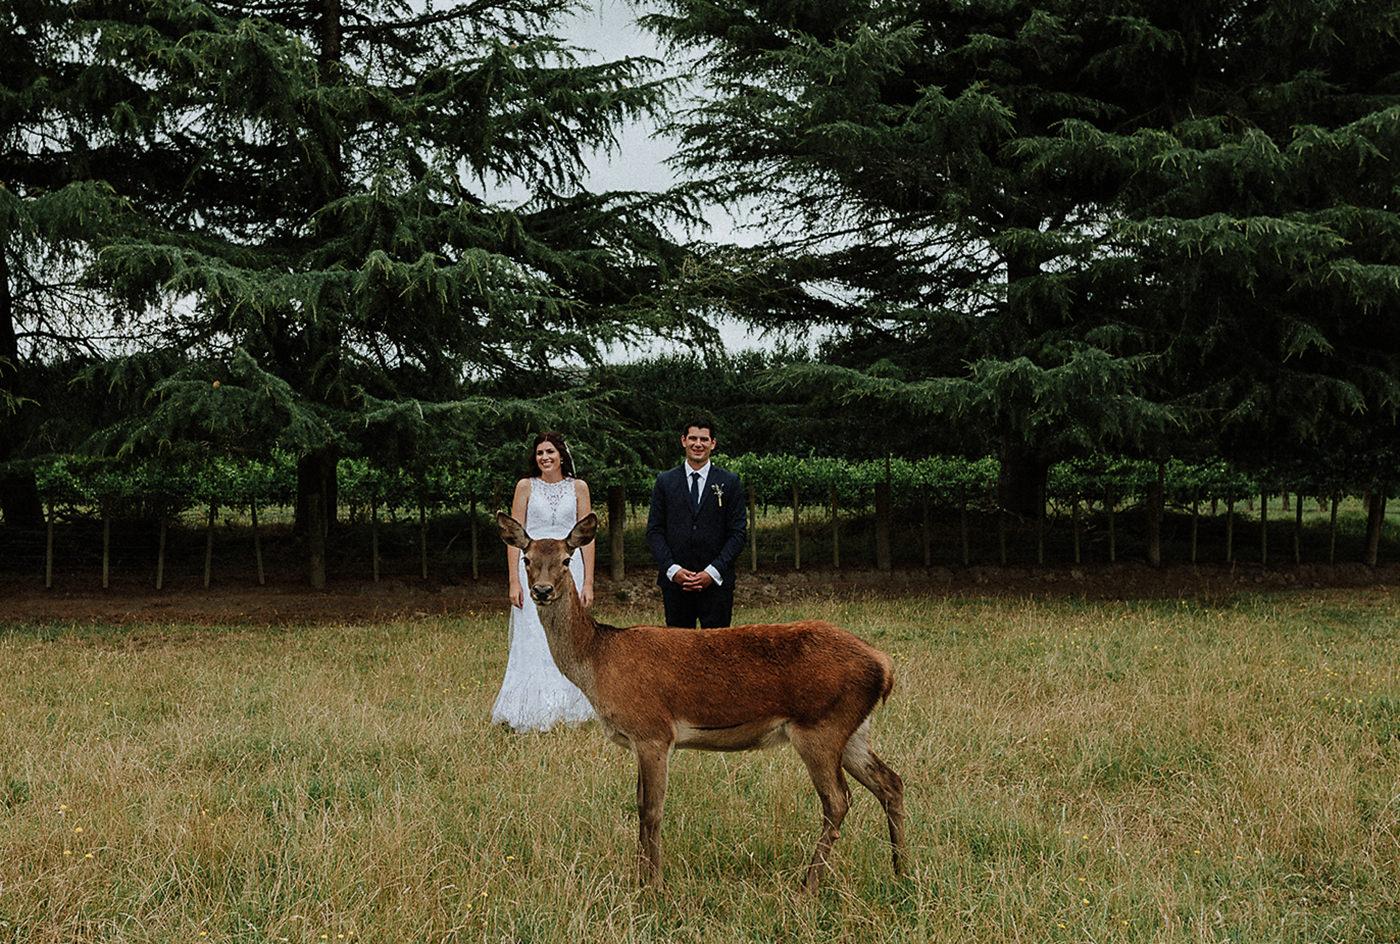 wedding_photographer_nz-00003.jpg